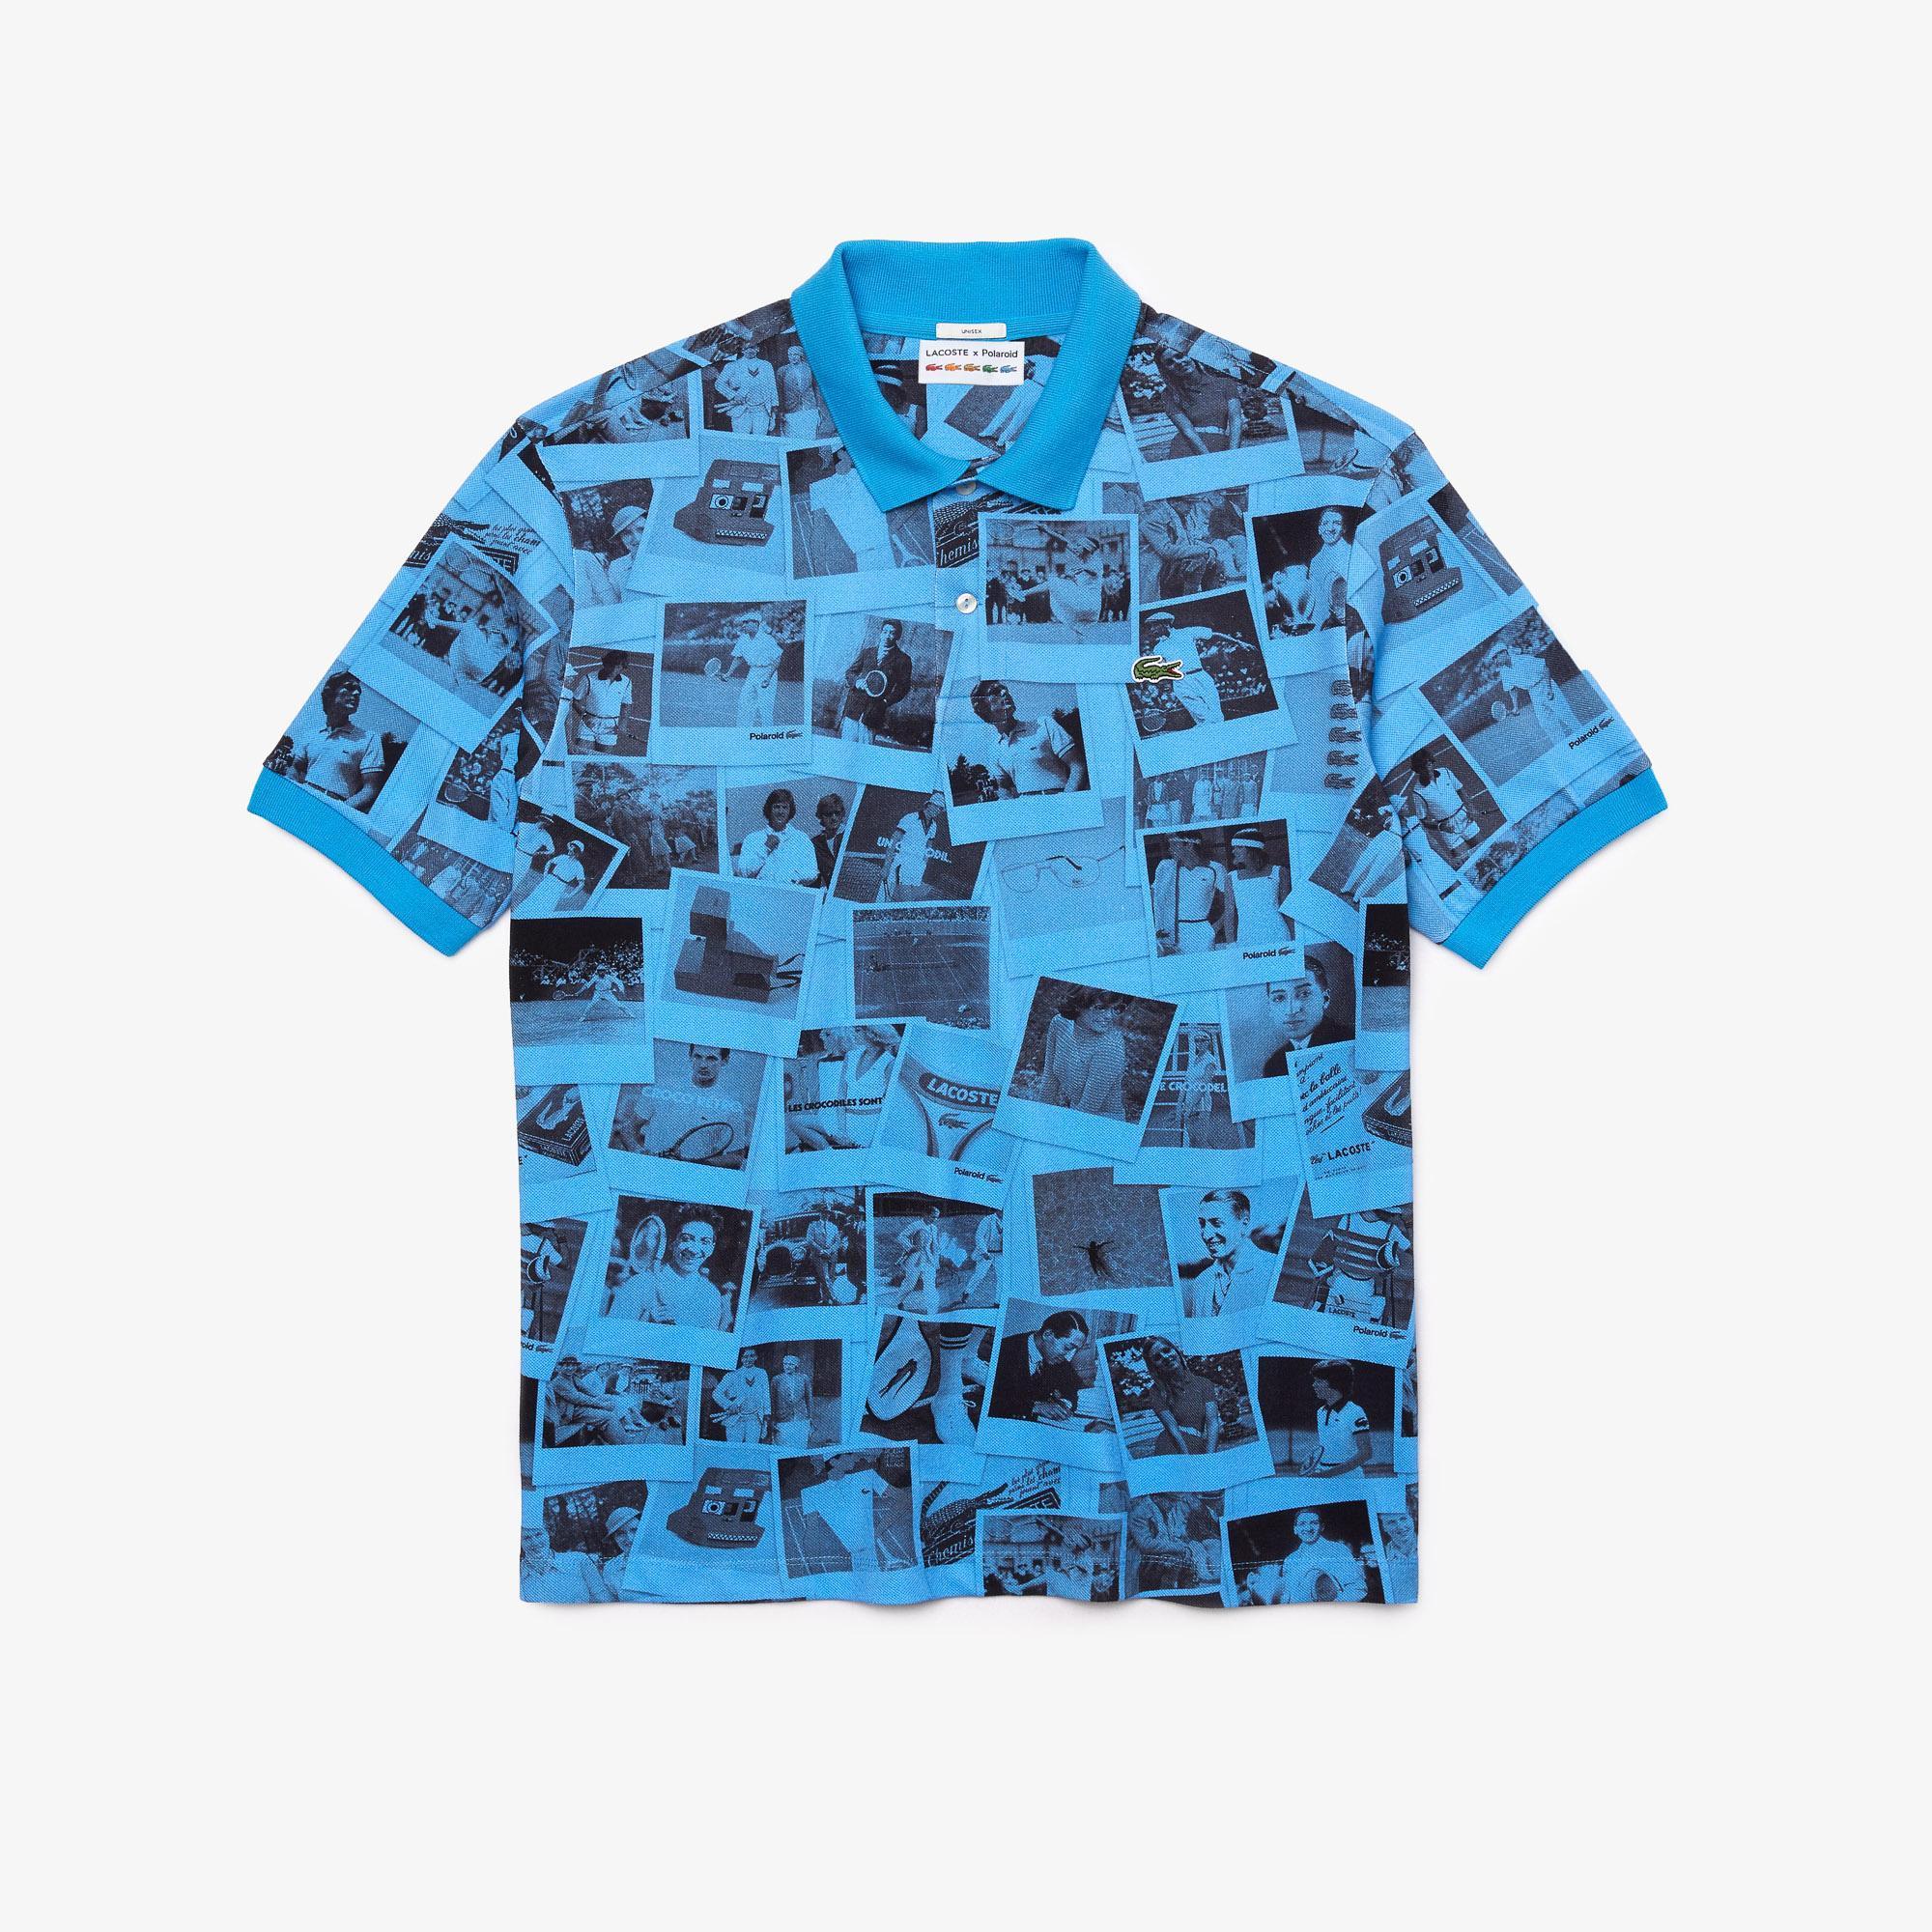 Lacoste L!ve x Polaroid Unisex Loose Fit Baskılı Mavi Polo